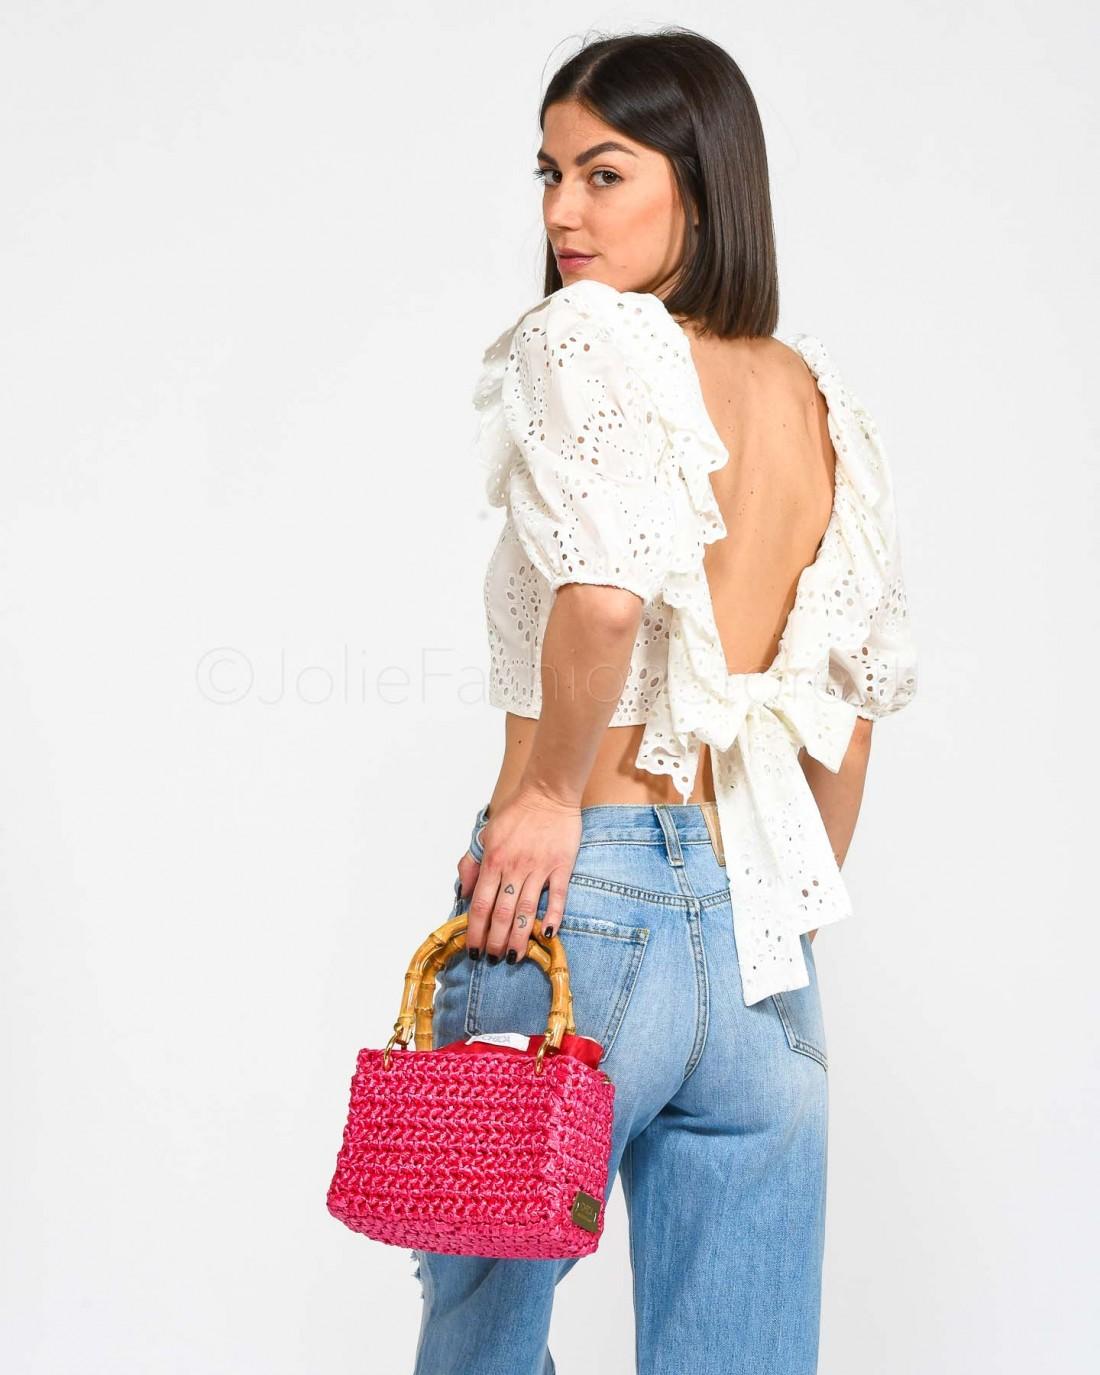 online store 3a4f9 f5392 Patrizia Pepe Jeans Basic Nero - A/I 2019/20